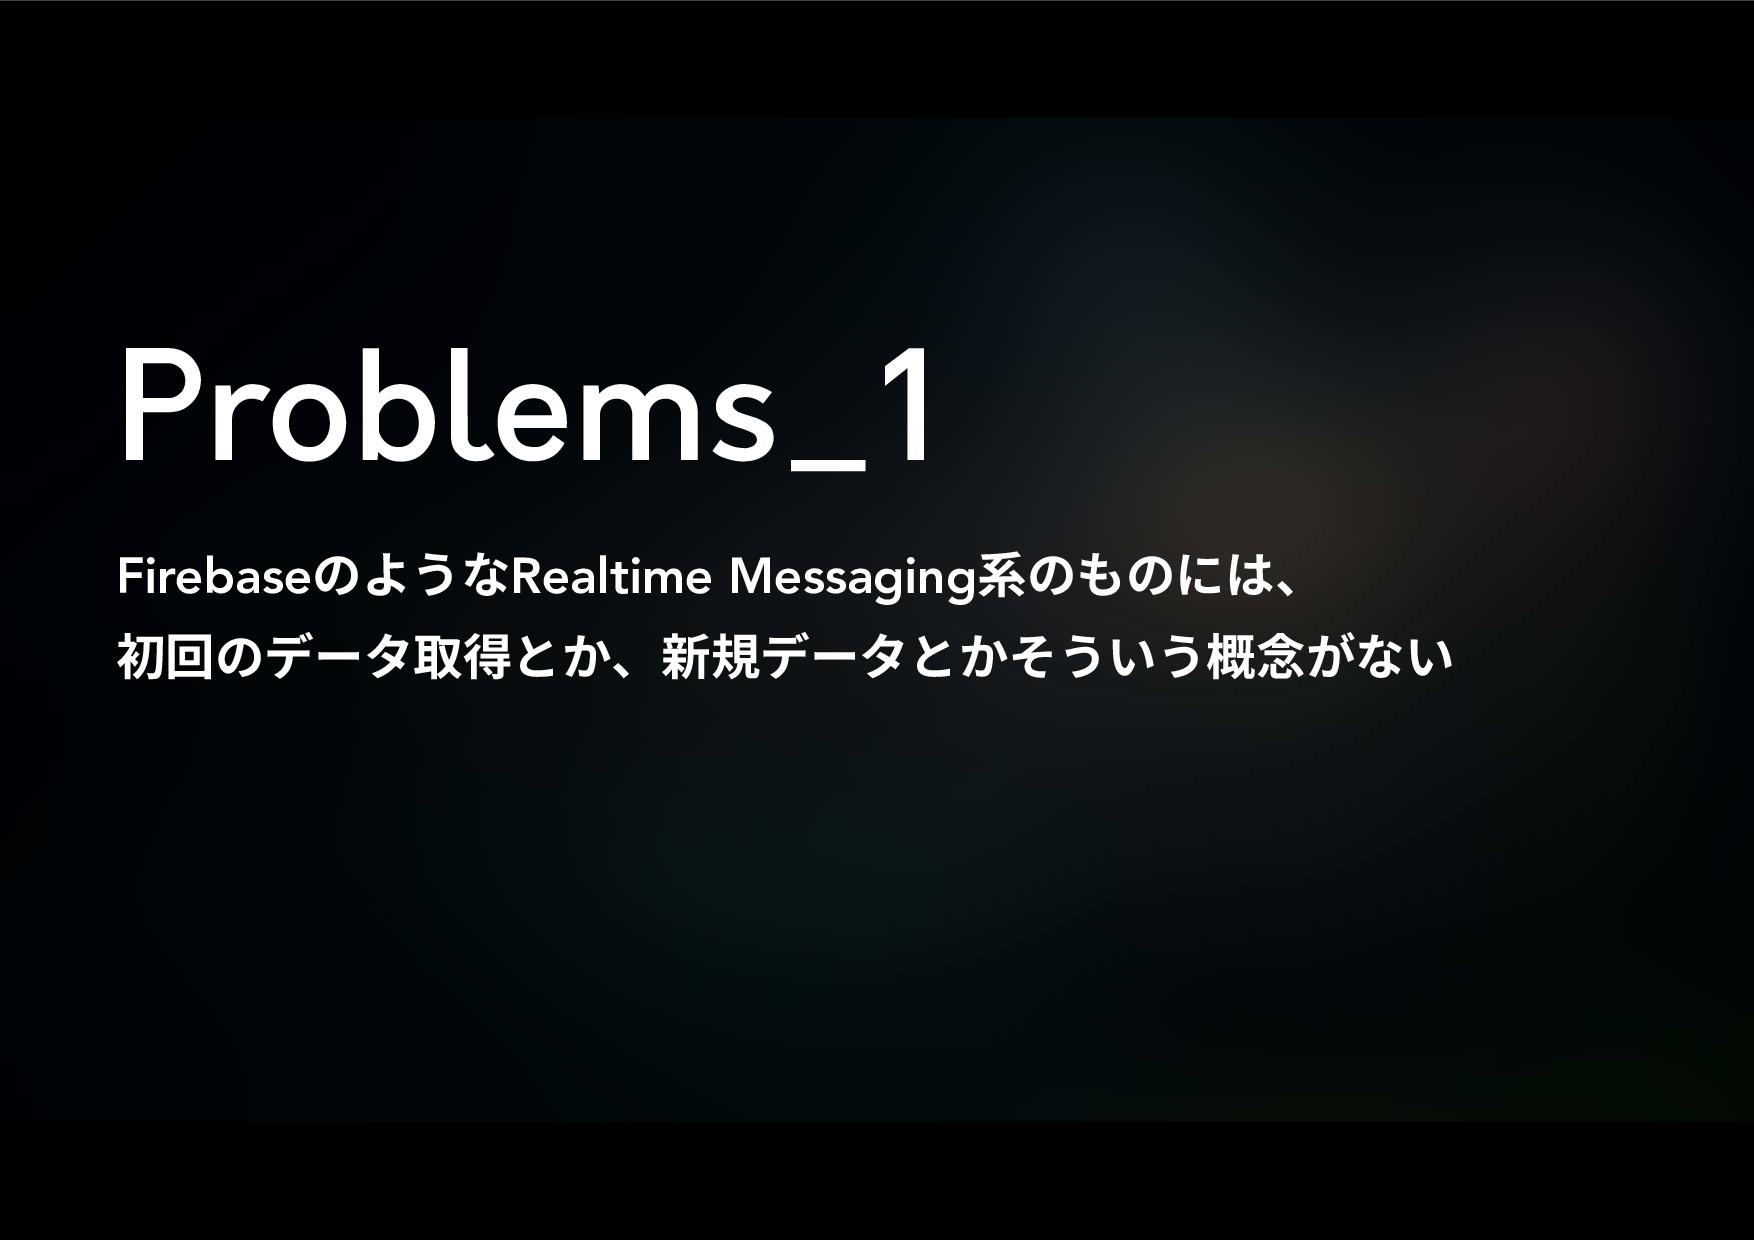 Problems_1 Firebaseך״ֲזRealtime Messaging禸ךךח...